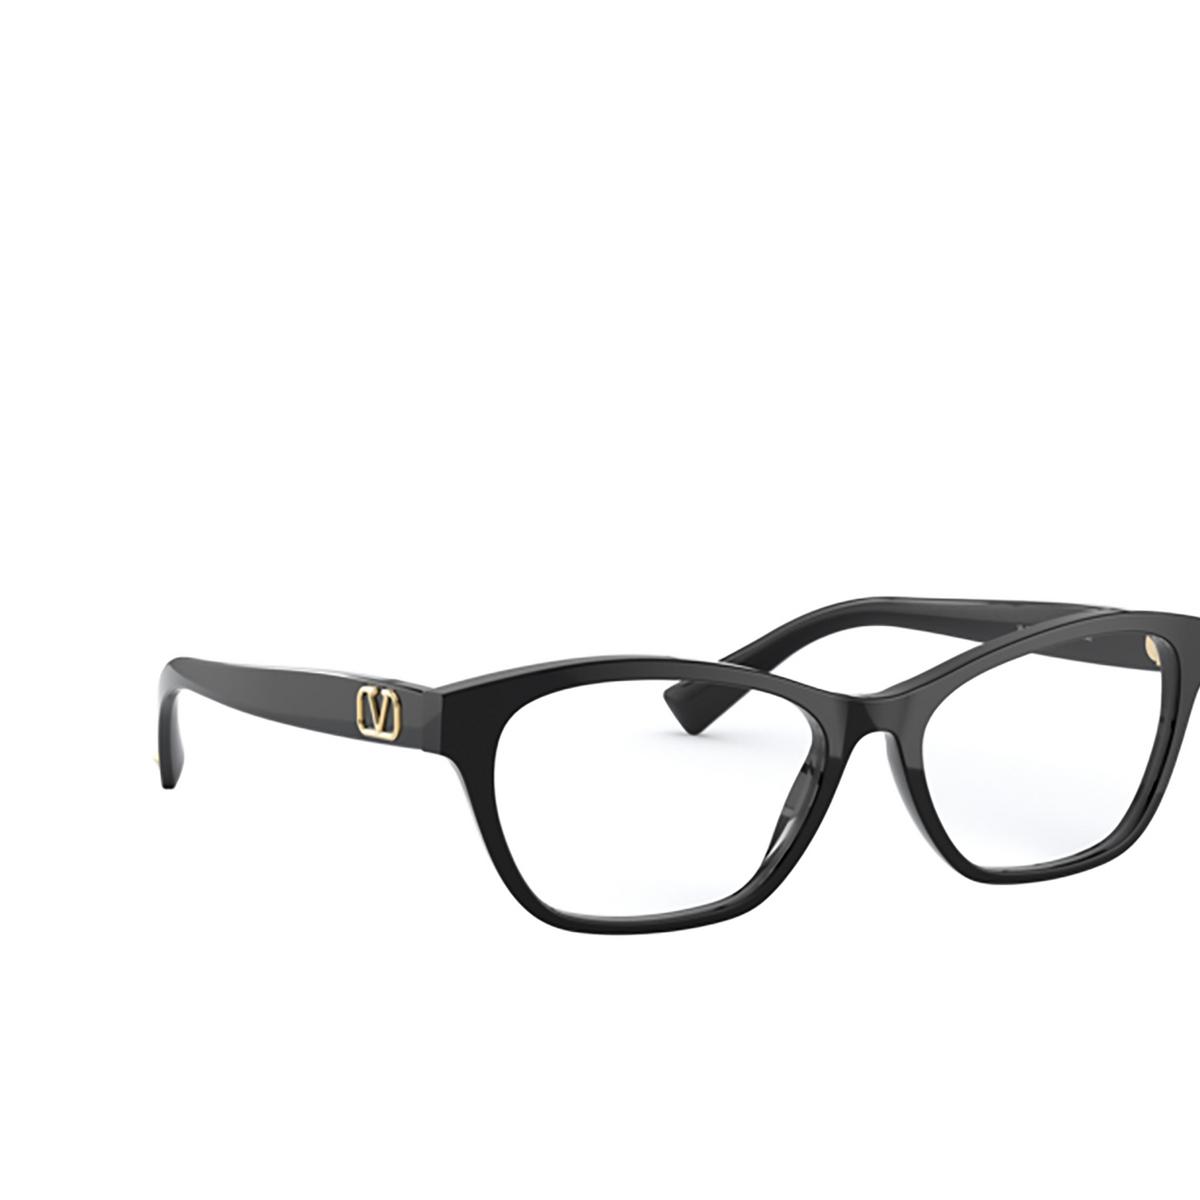 Valentino® Butterfly Eyeglasses: VA3056 color Black 5001 - three-quarters view.